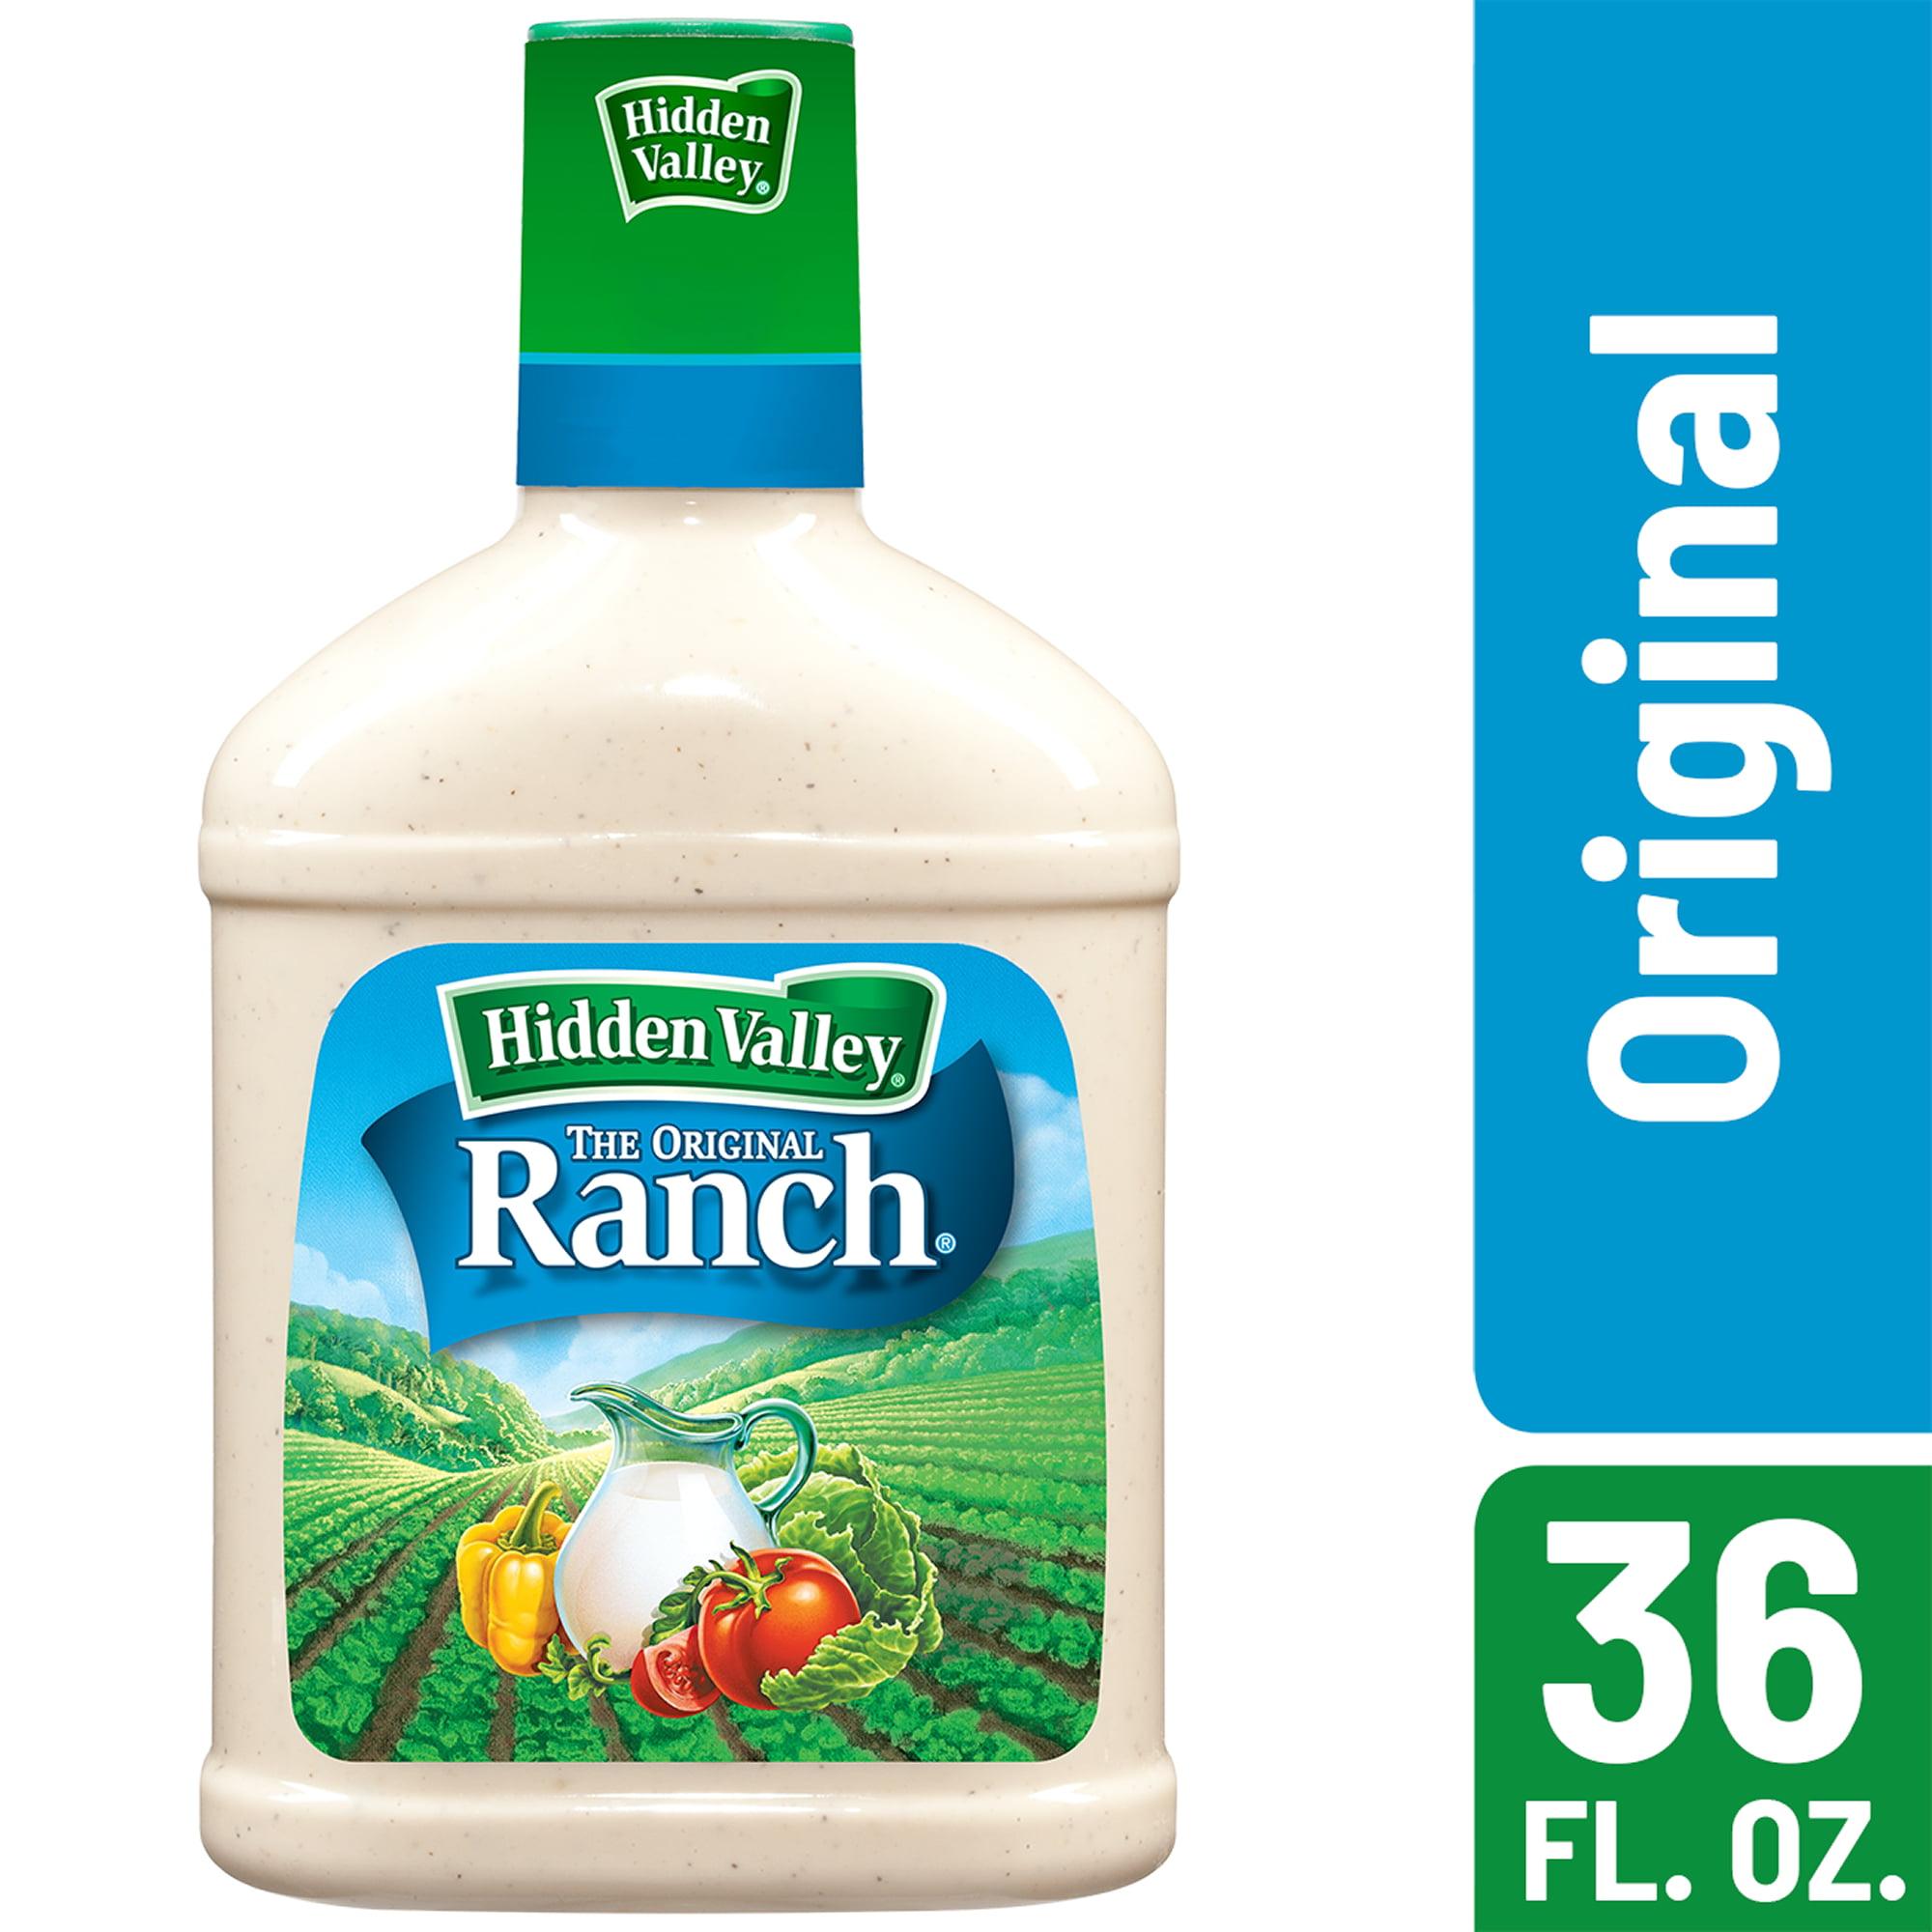 Hidden Valley Original Ranch Salad Dressing & Topping, Gluten Free - 36 oz Bottle